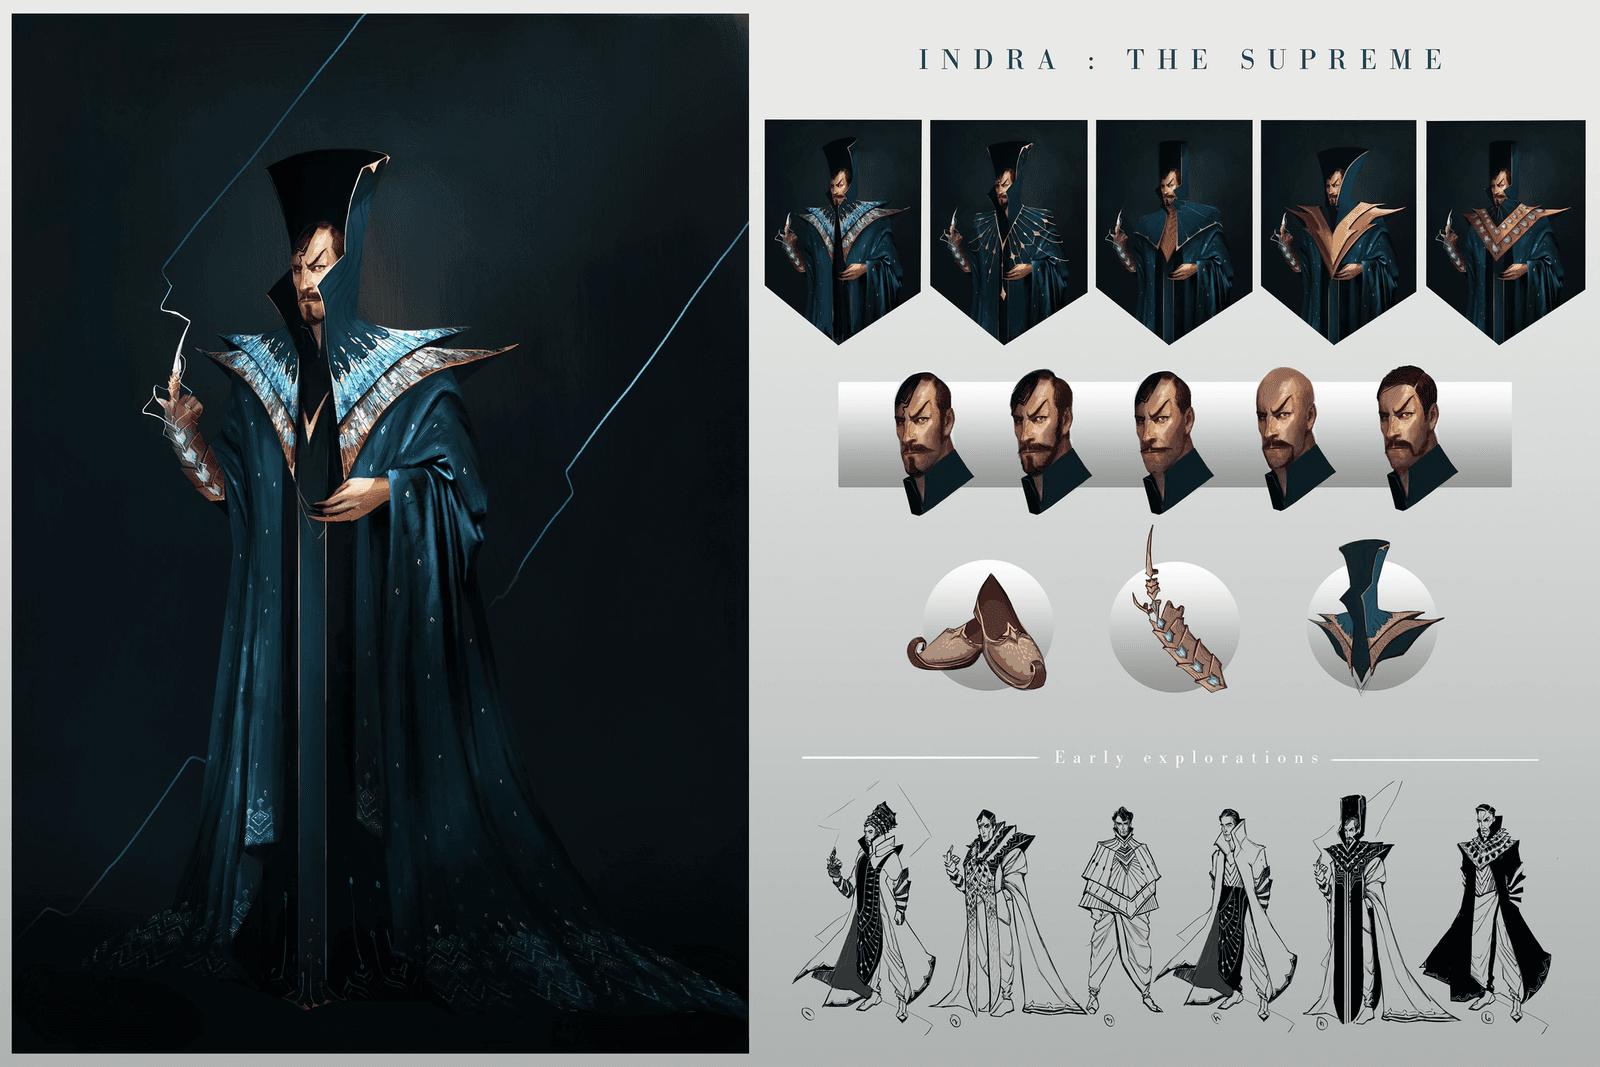 Indra The Supreme